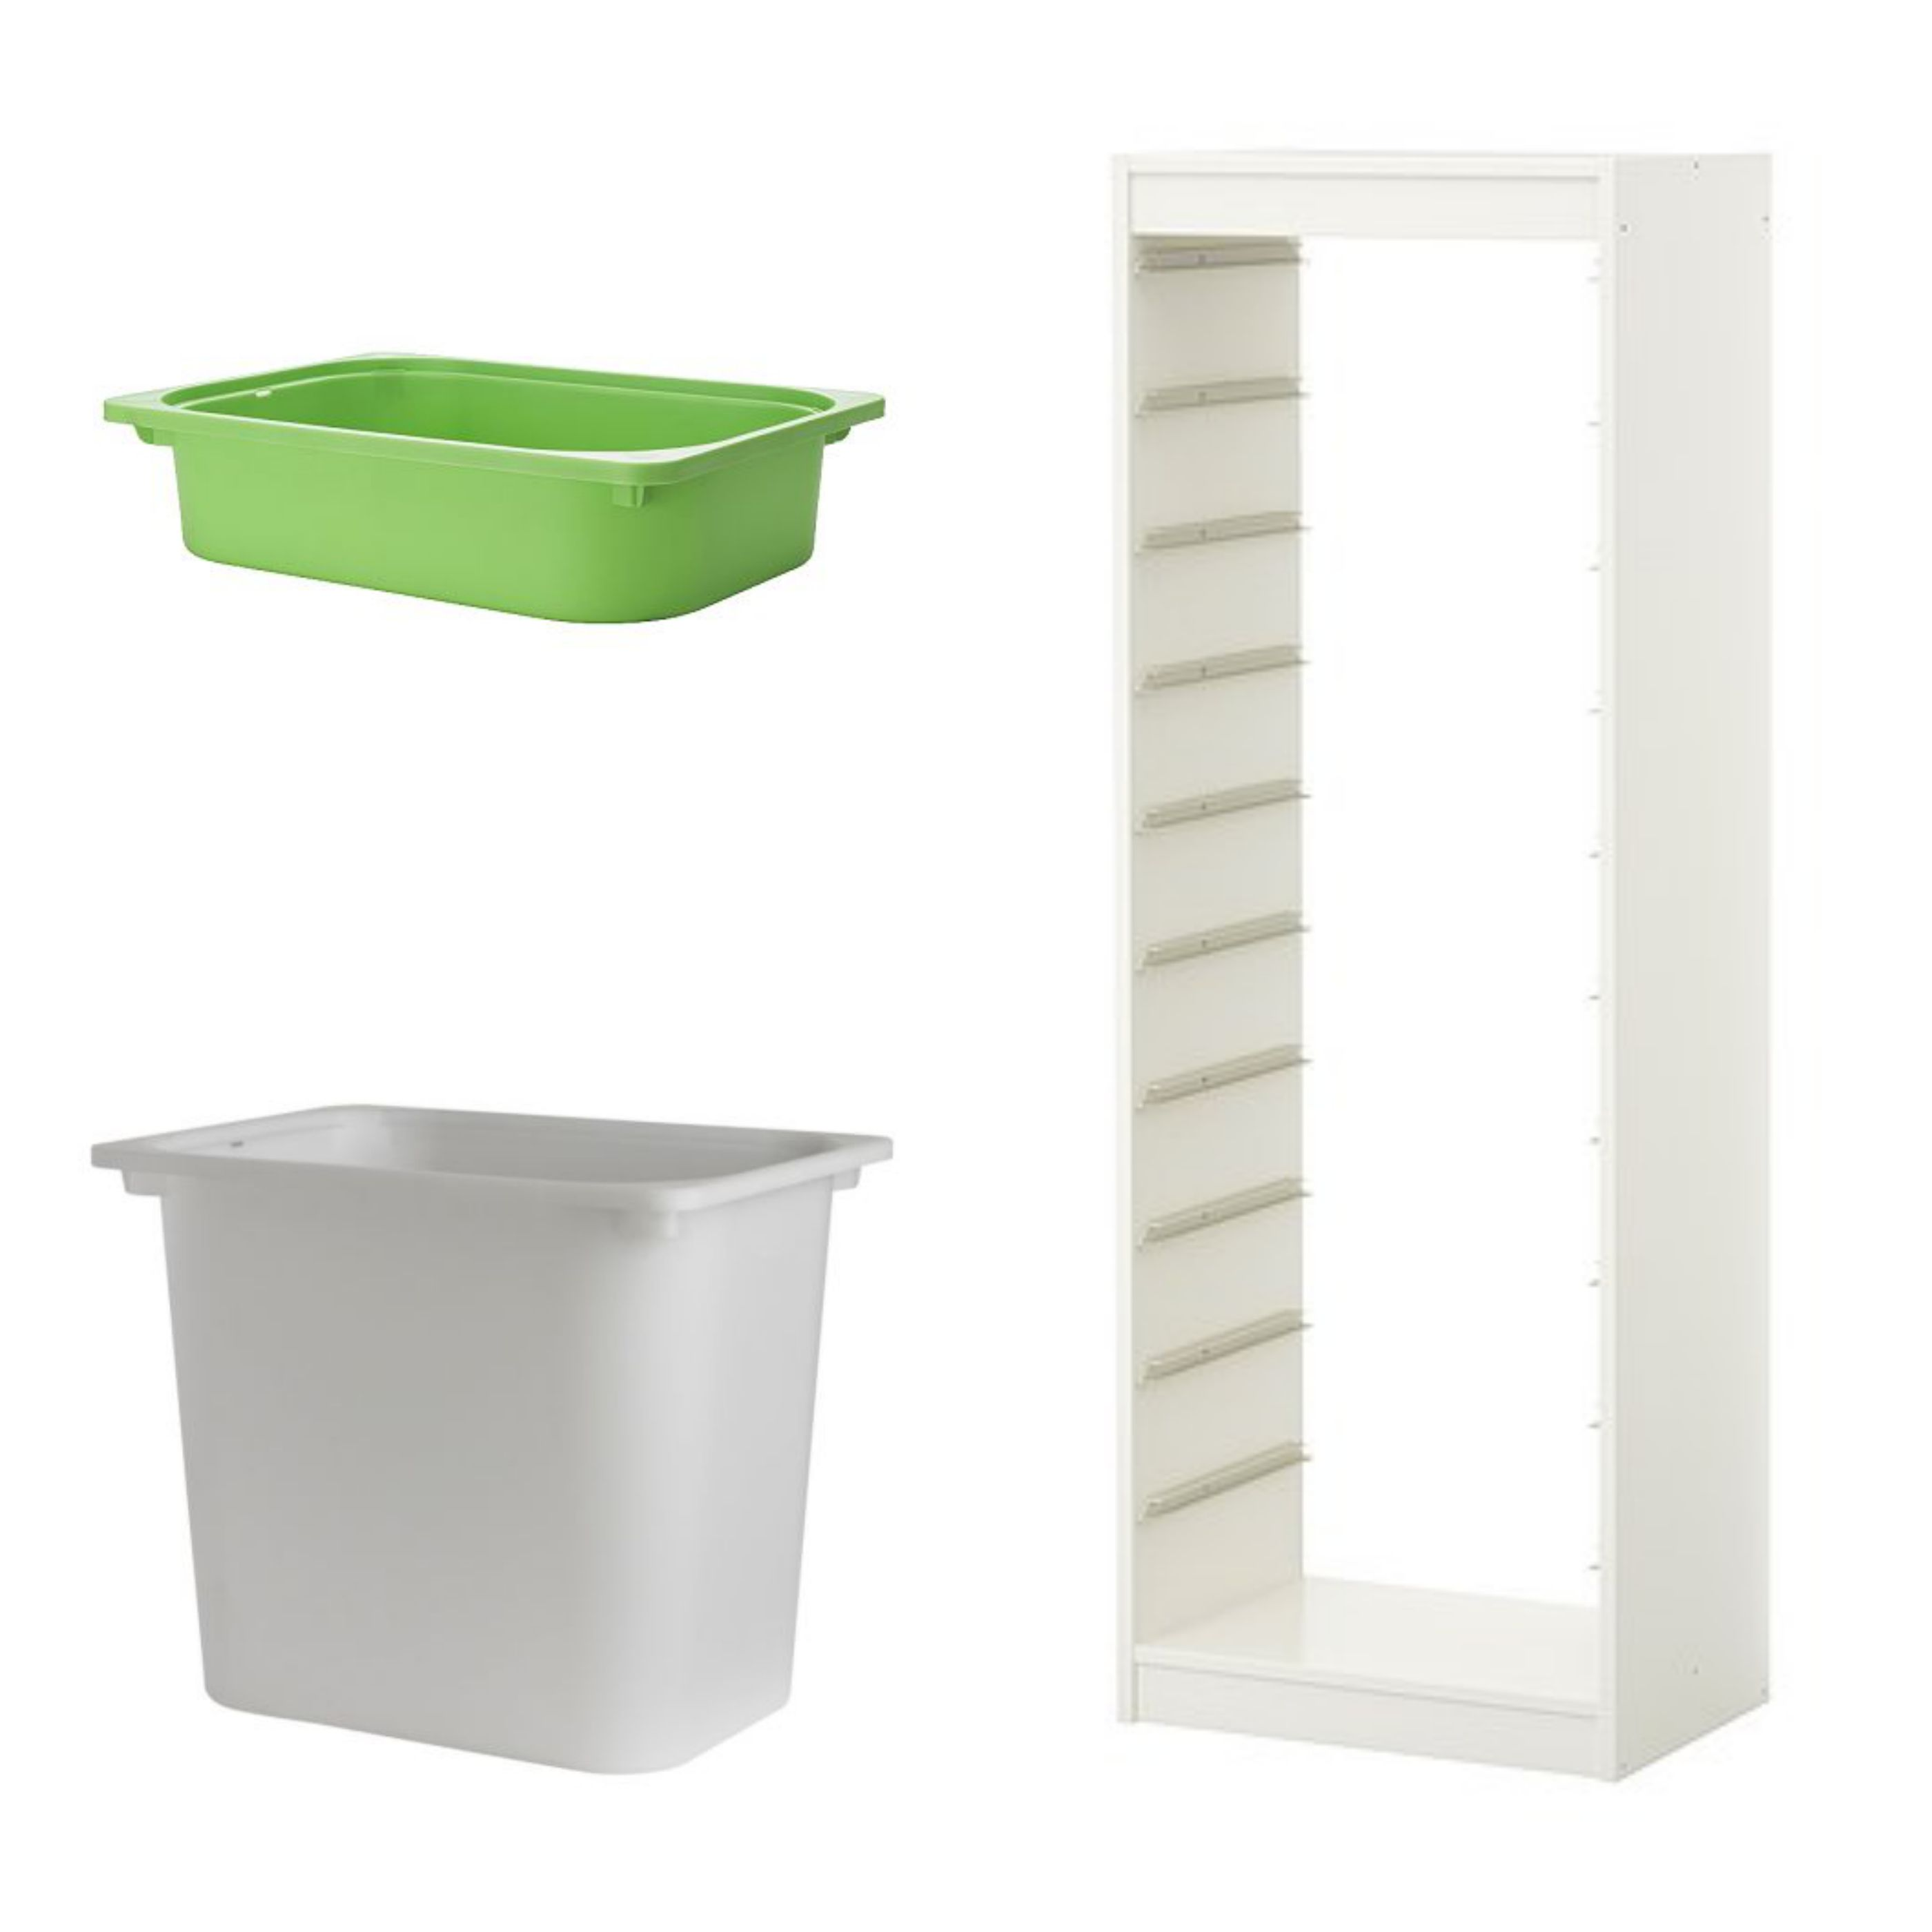 Trofast Ikea Perfect For Sorting Laundry Ikea Hacks